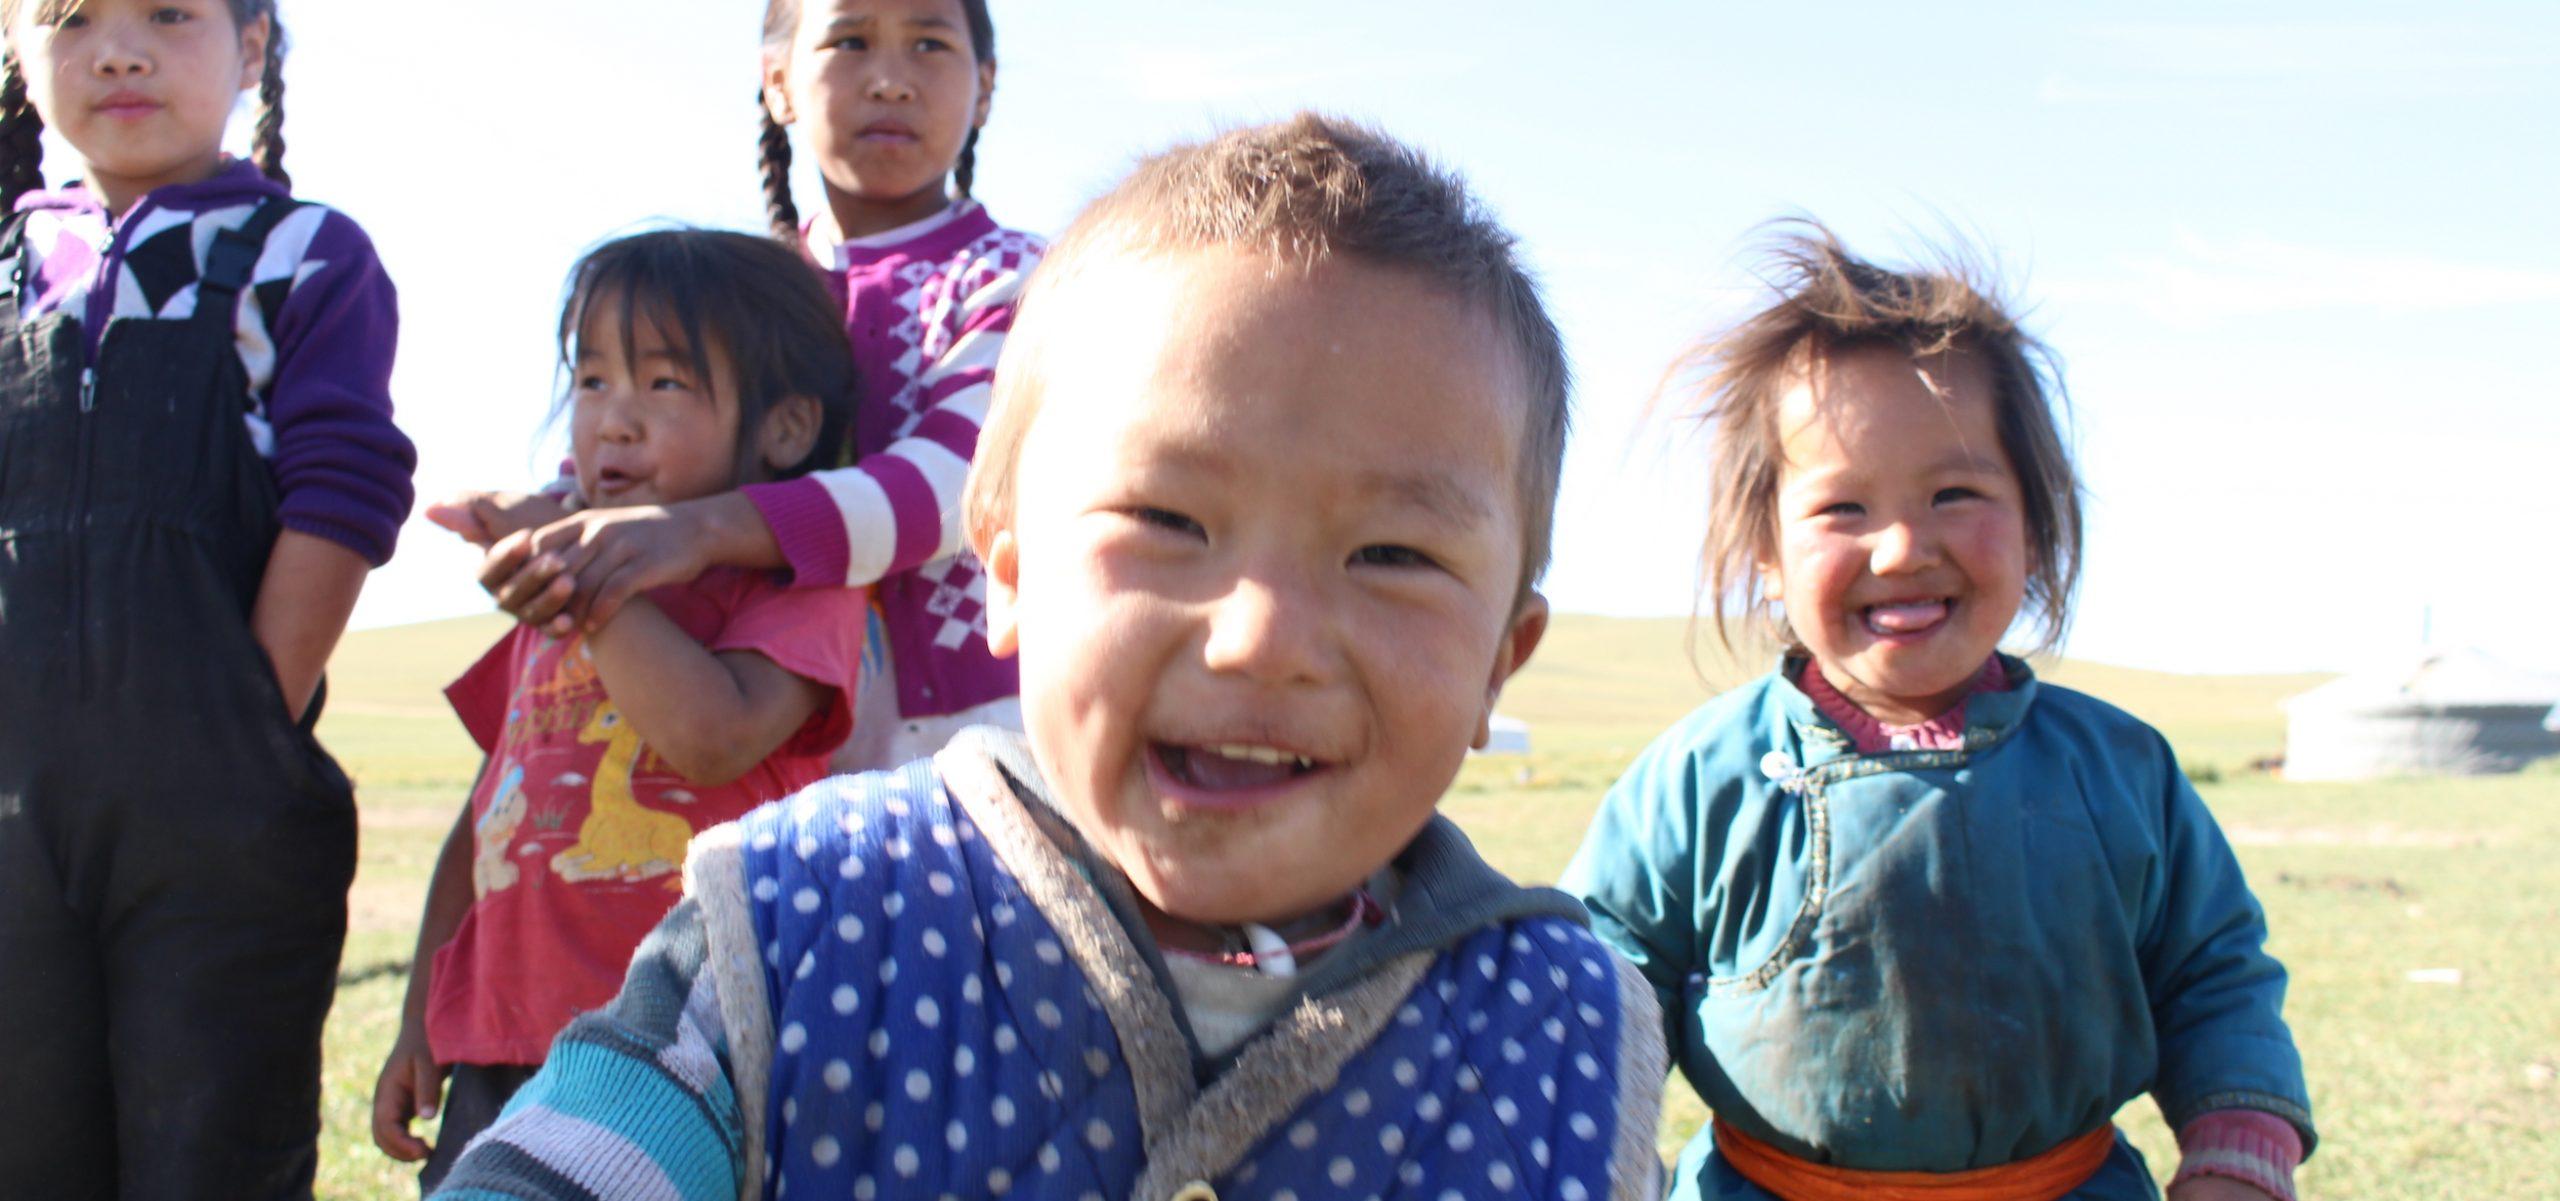 Mongolia - Kids